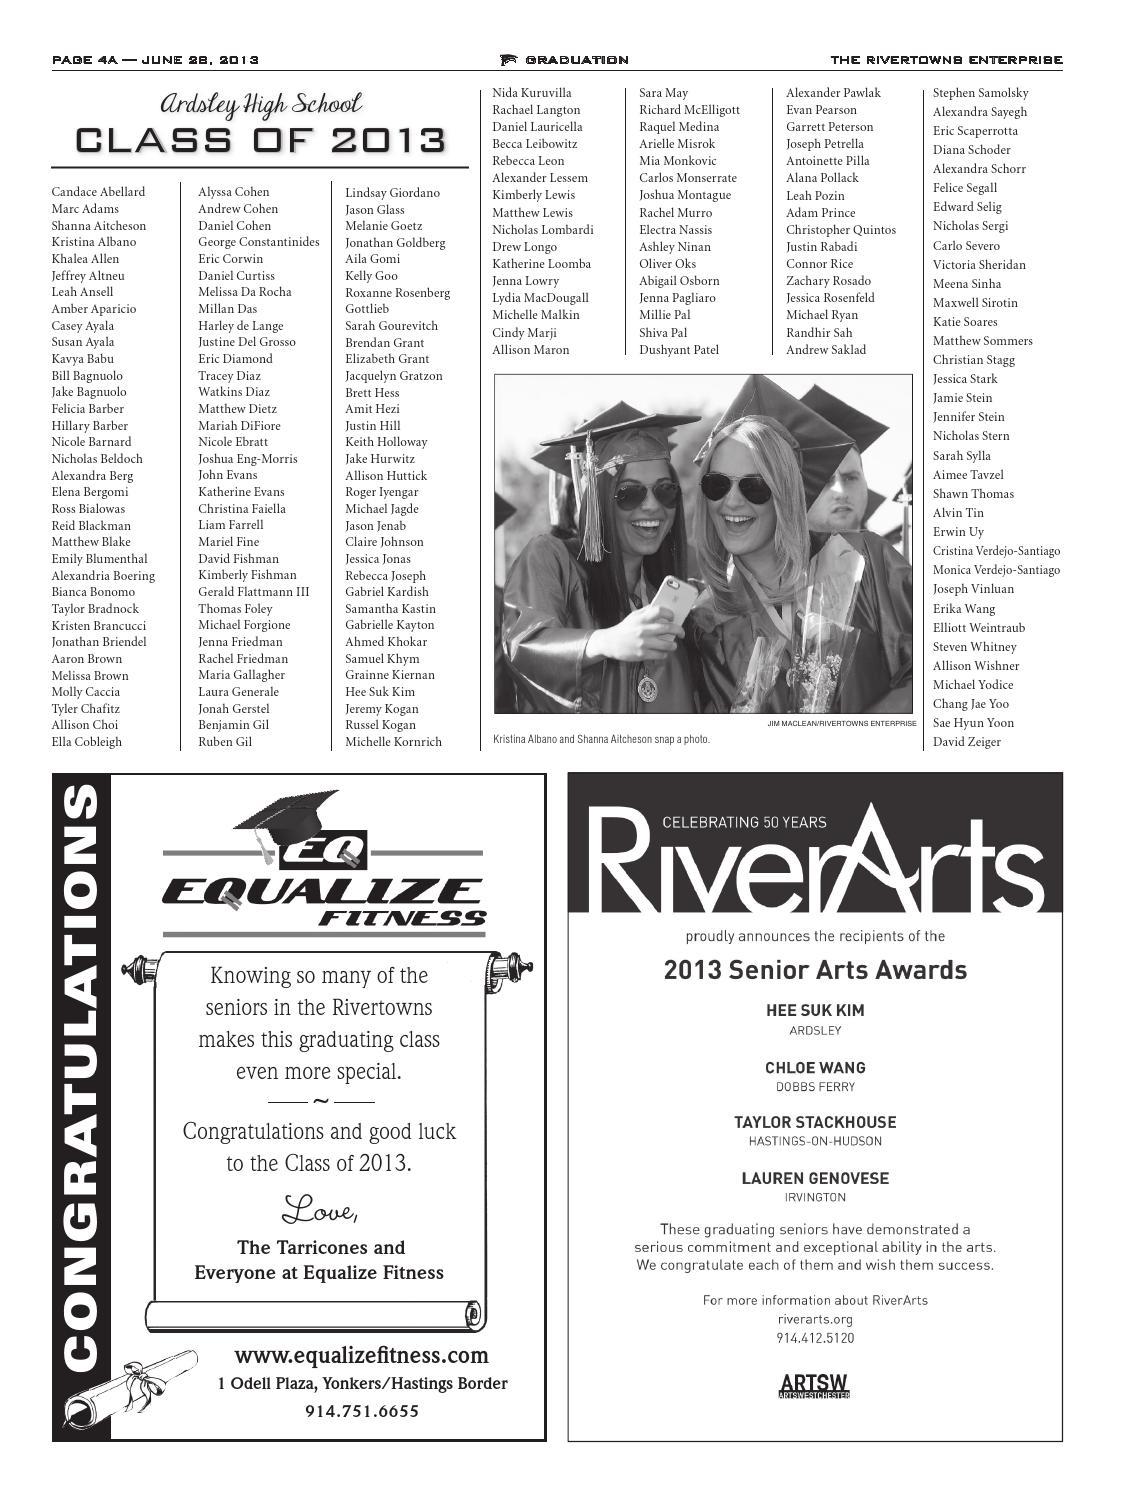 Rivertowns Enterprise Graduation 2013 by The Rivertowns